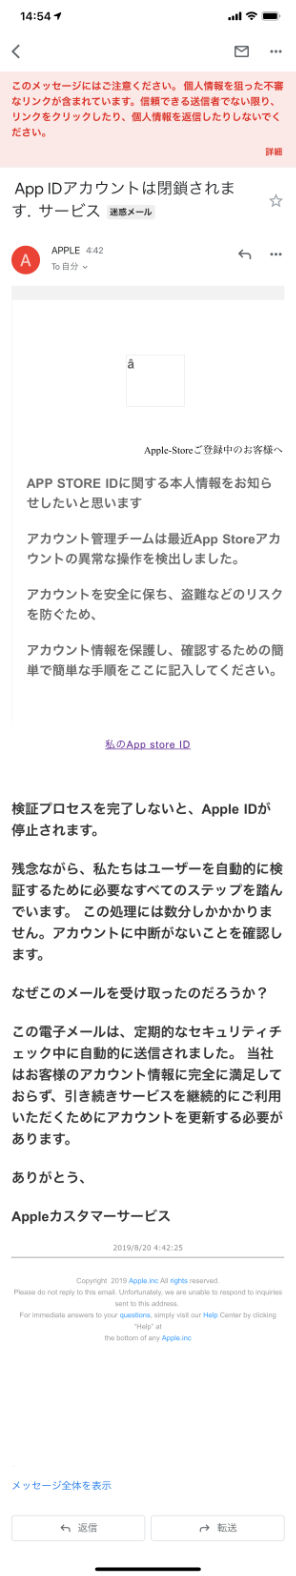 Apple全文